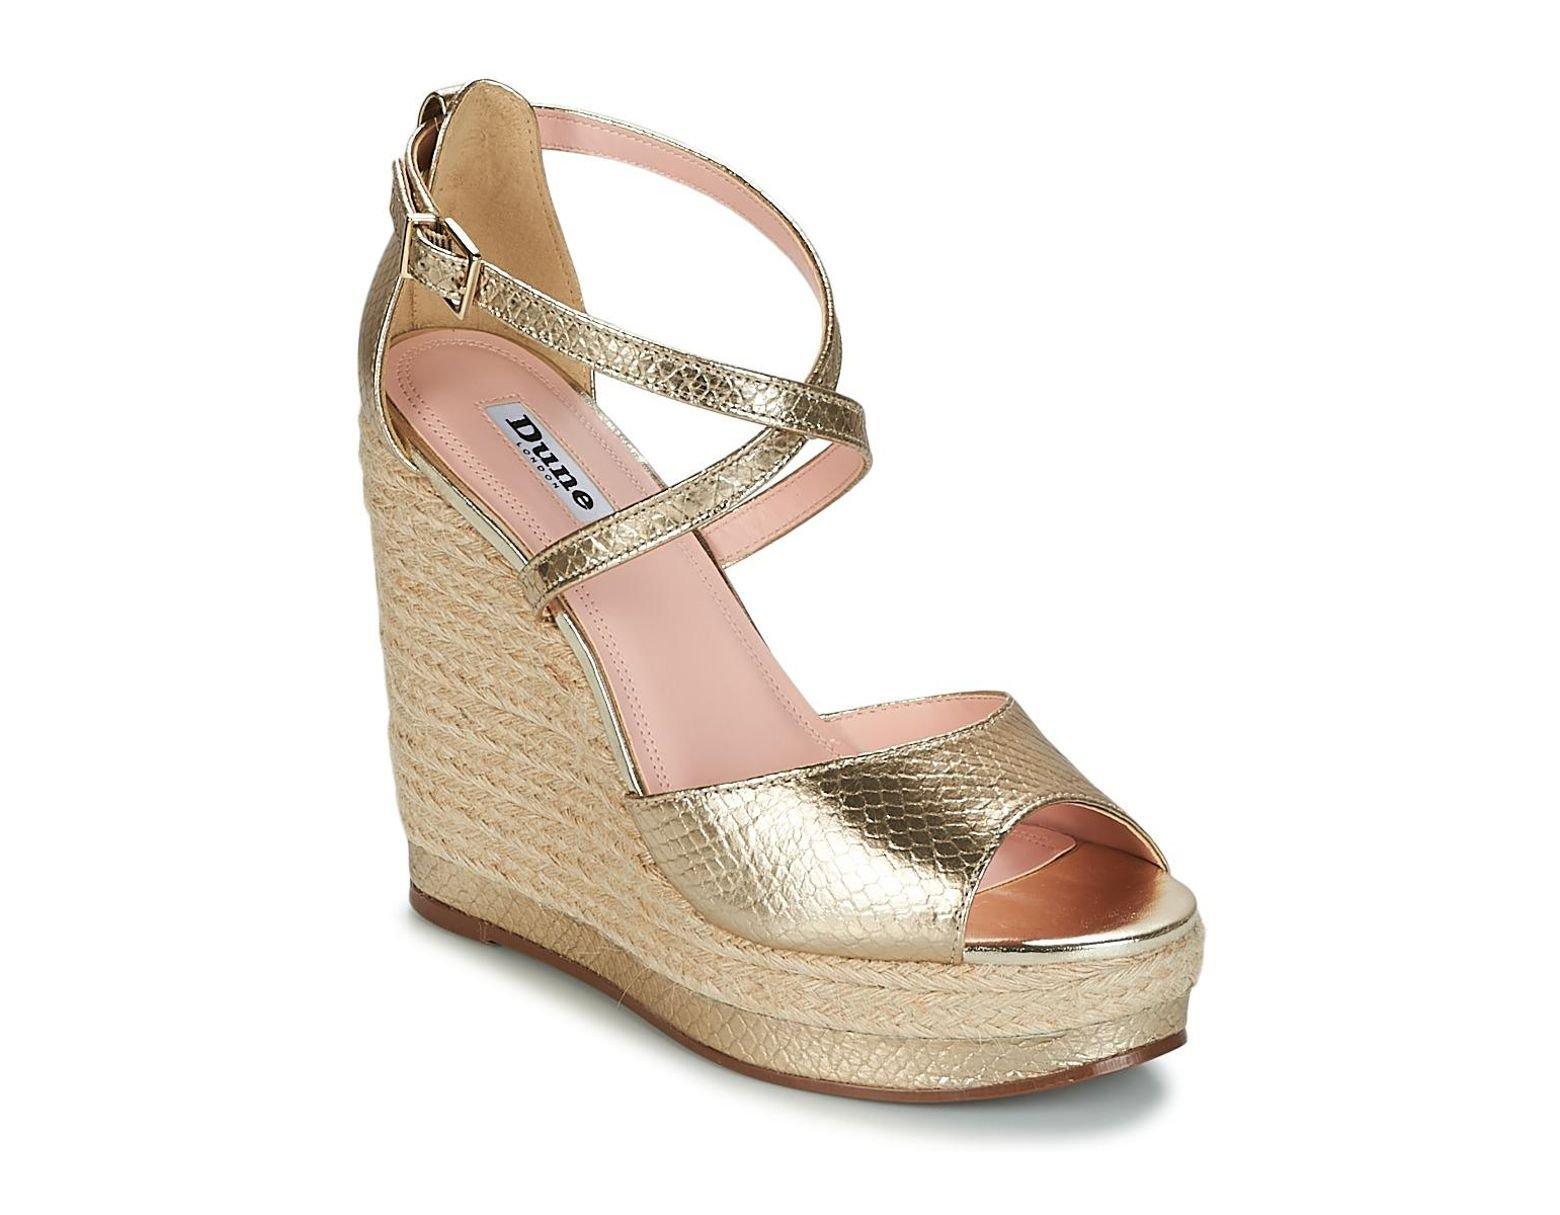 c12b5e1258 Dune Kandis Sandals in Metallic - Lyst